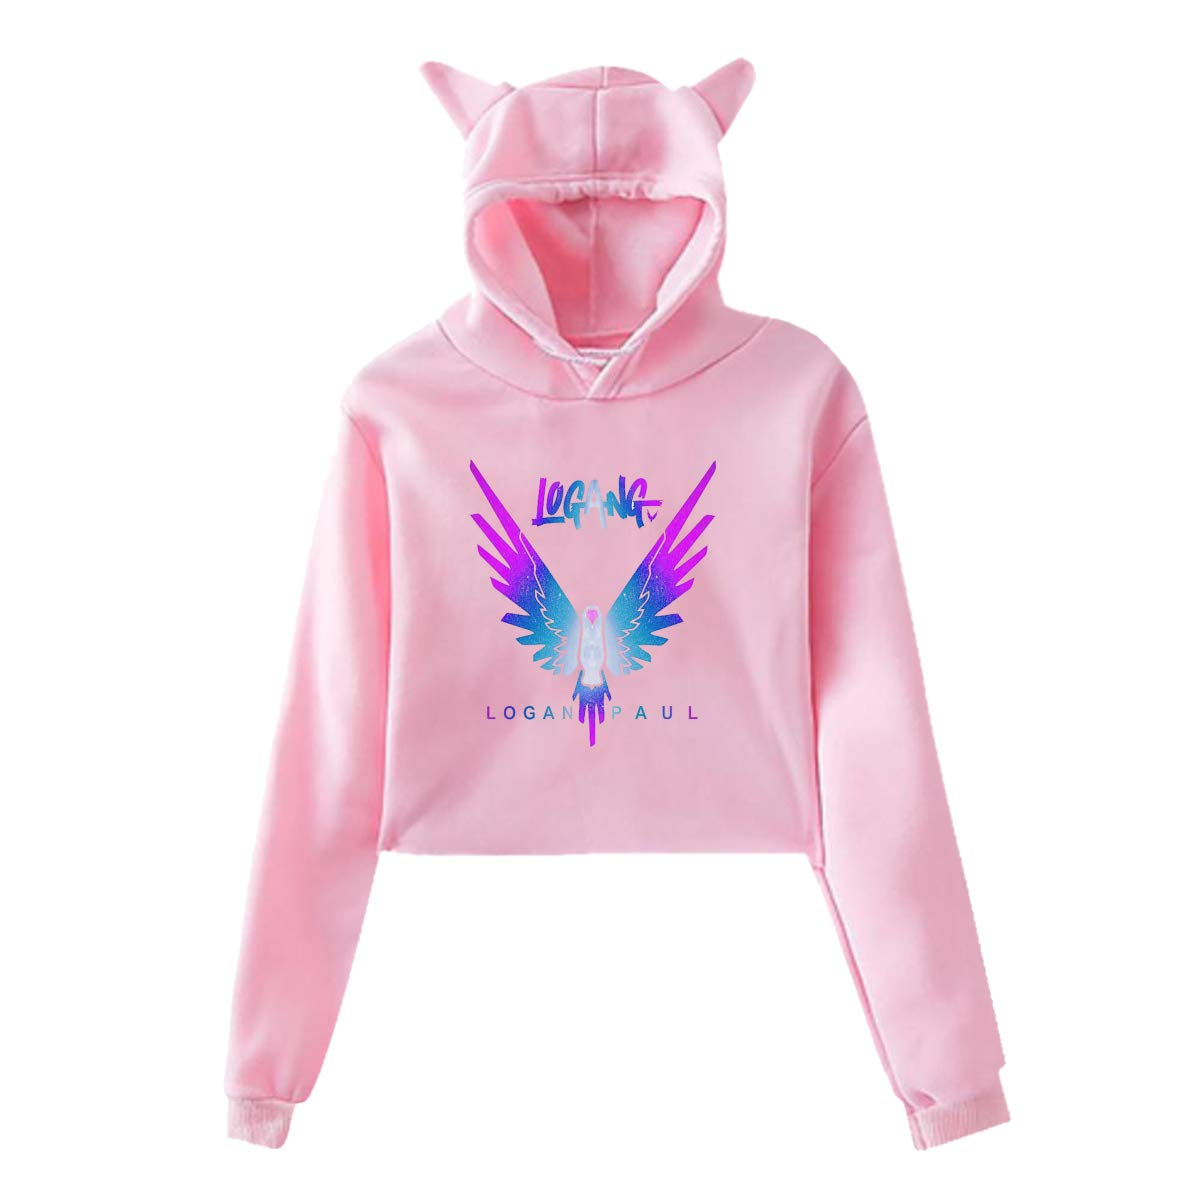 Youth Girls Hoodie Jake Paul Logang Logan Paul Maverick Cat Ear Sweatershirt Long Sleeve Crop Top Hoodies for Girls Pink L by BKashy